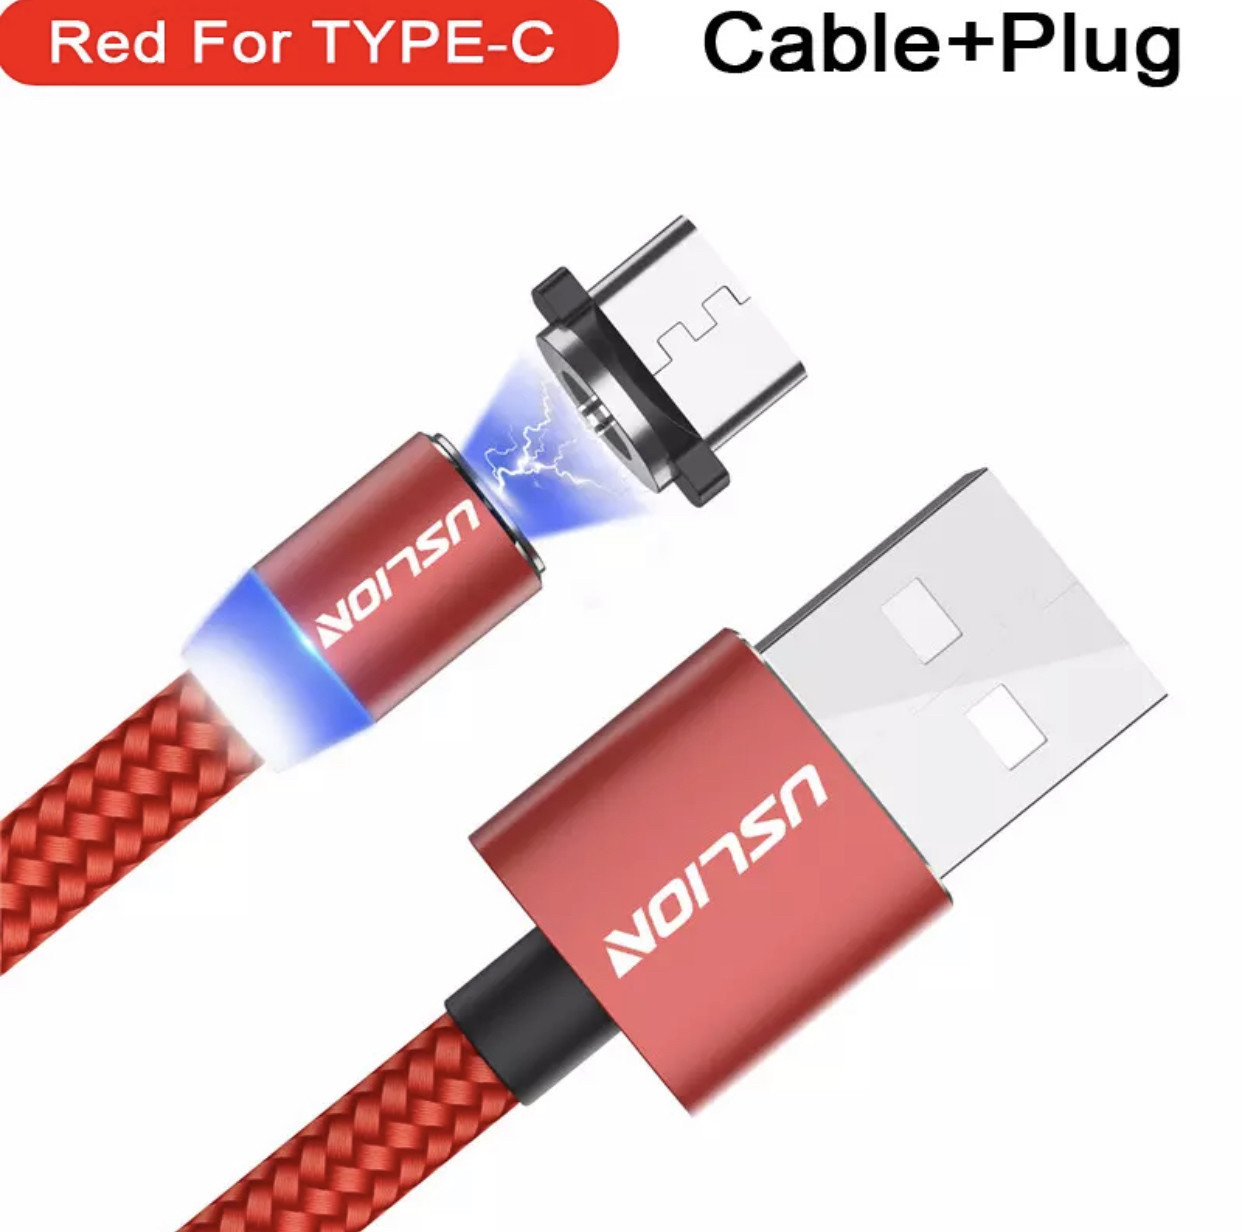 Магнитный кабель Lighting + стекло для Iphone/IPad шнур red